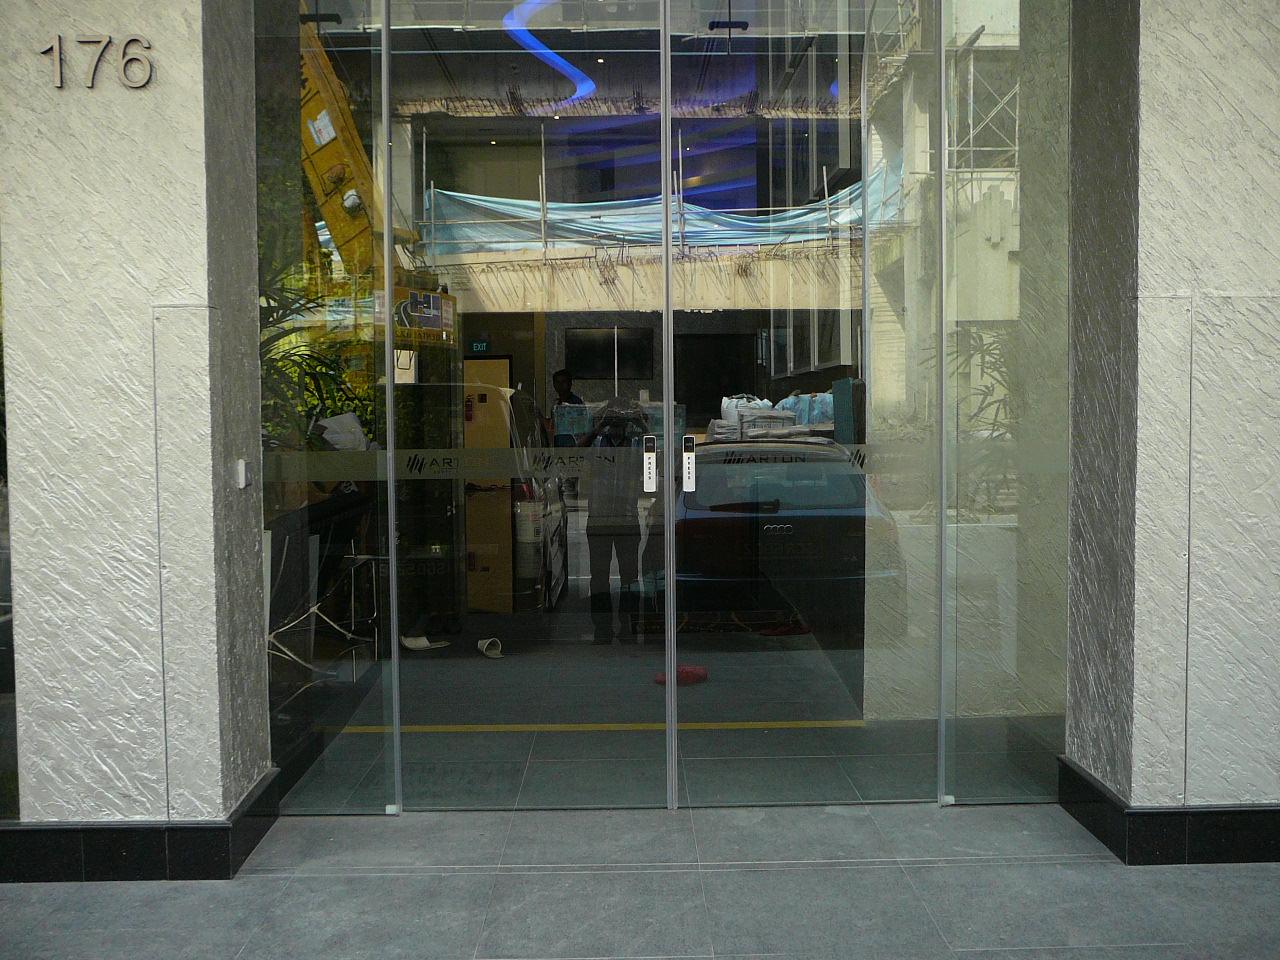 FastLogs installed in new hotel on Tyrwhitt Rd in Singapore. Photo: Pre-deployment.